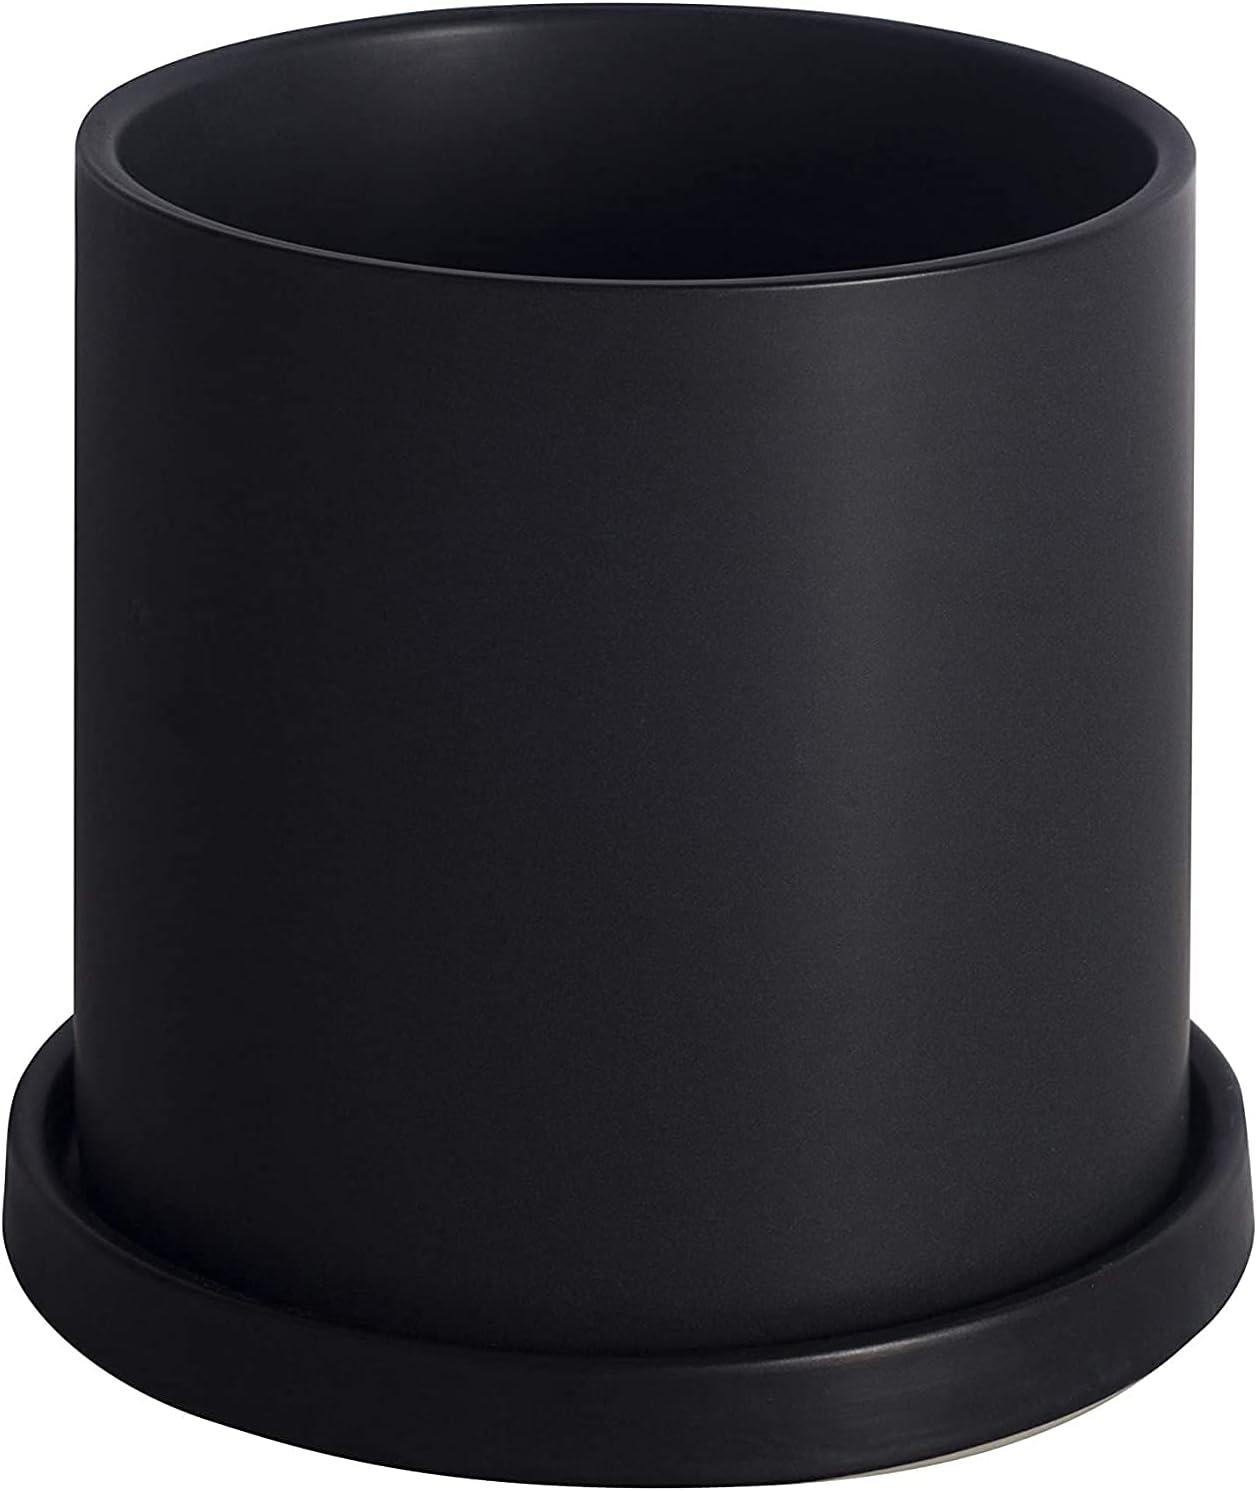 Ekirlin 6 inch Plant Pot - Flower Planters Indoor Mode Sales Ranking TOP5 Ceramic